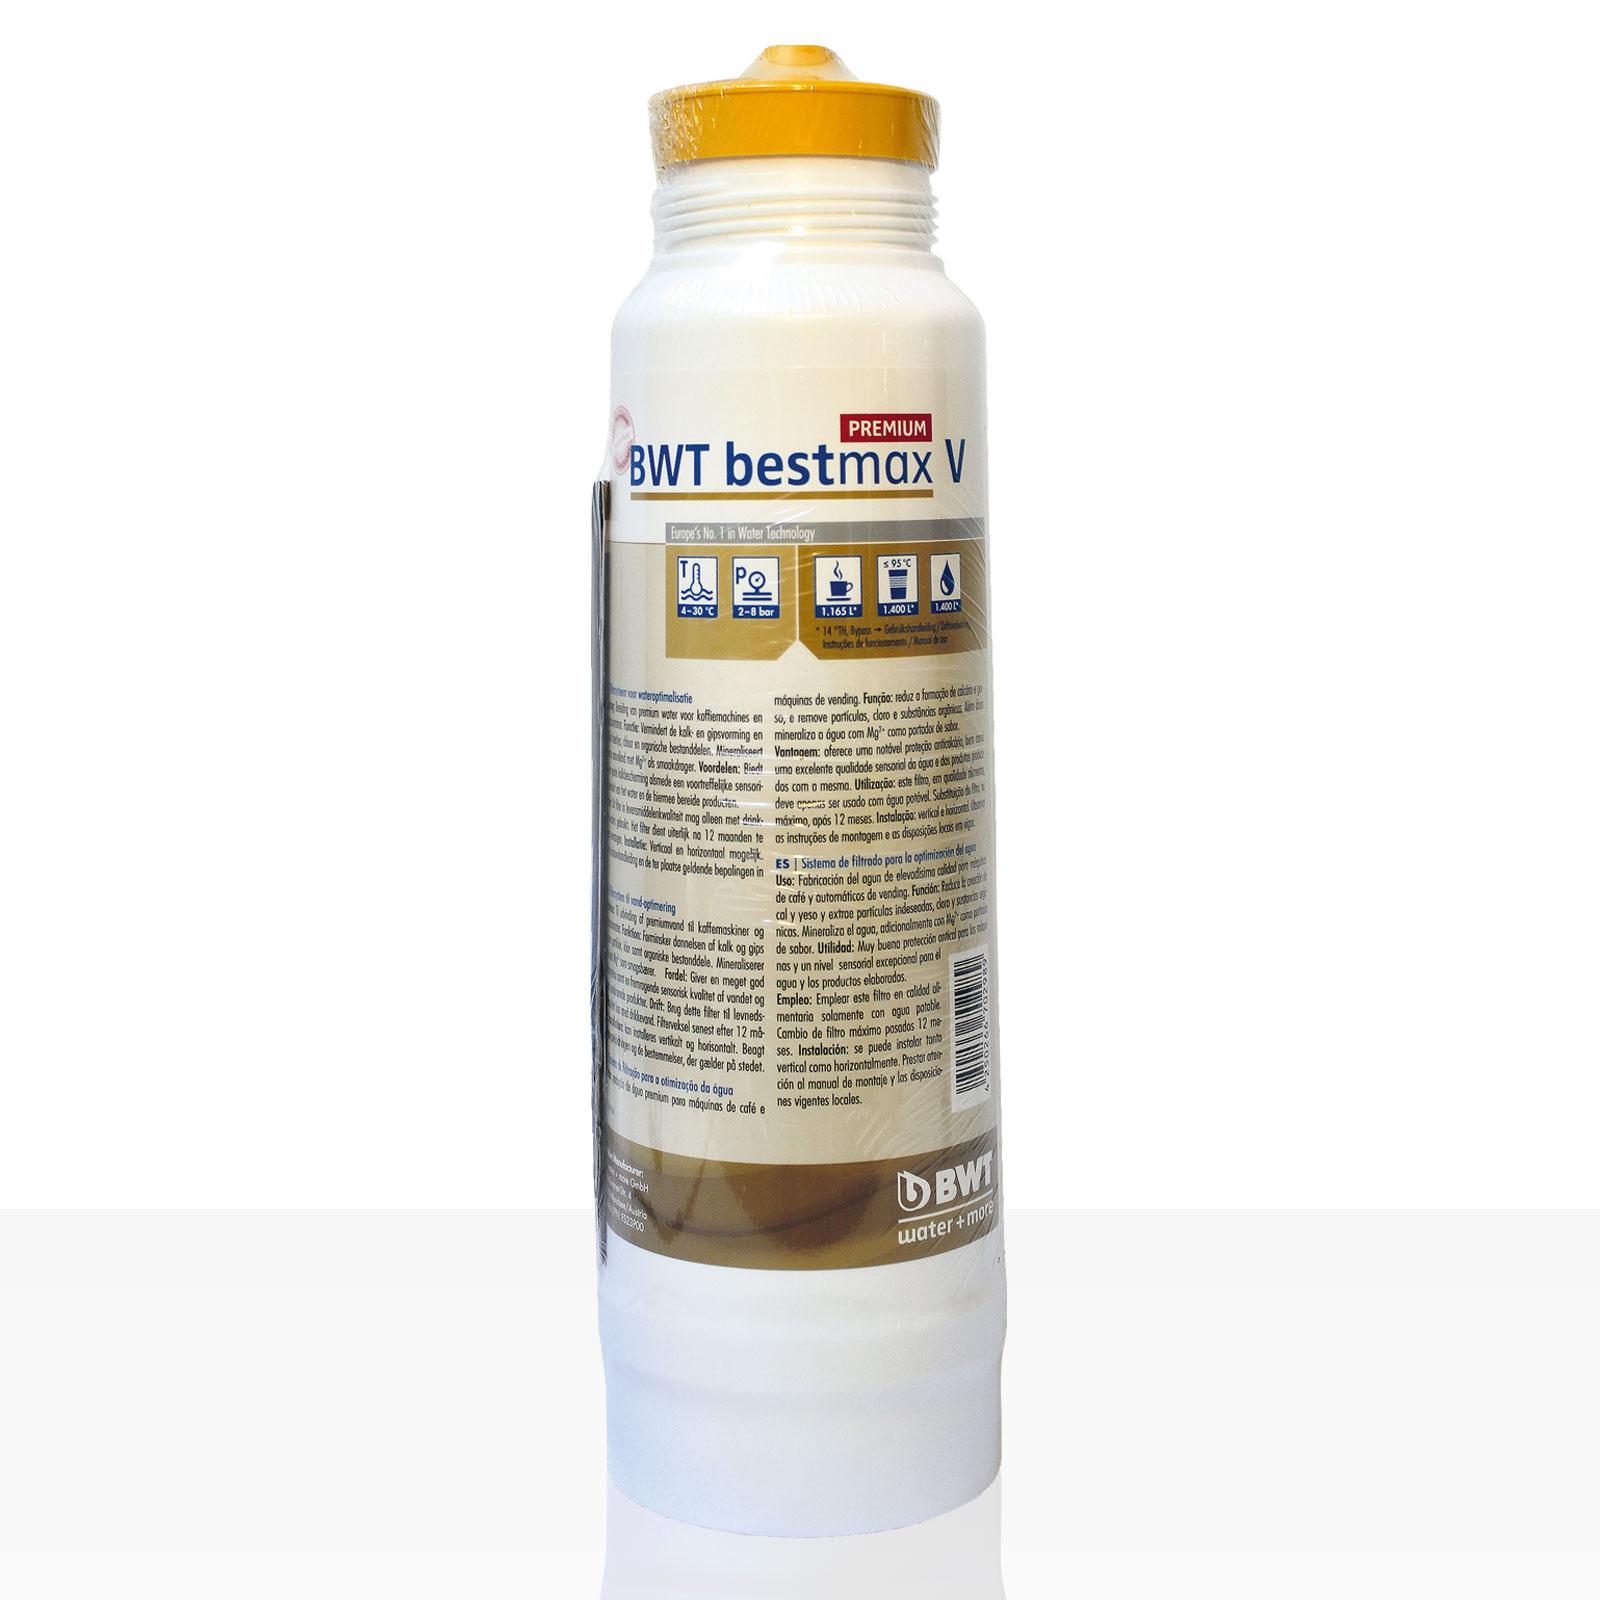 Bestmax V Premium Filterkerze BWT water + more Wasserfilter, ca. 1800 L